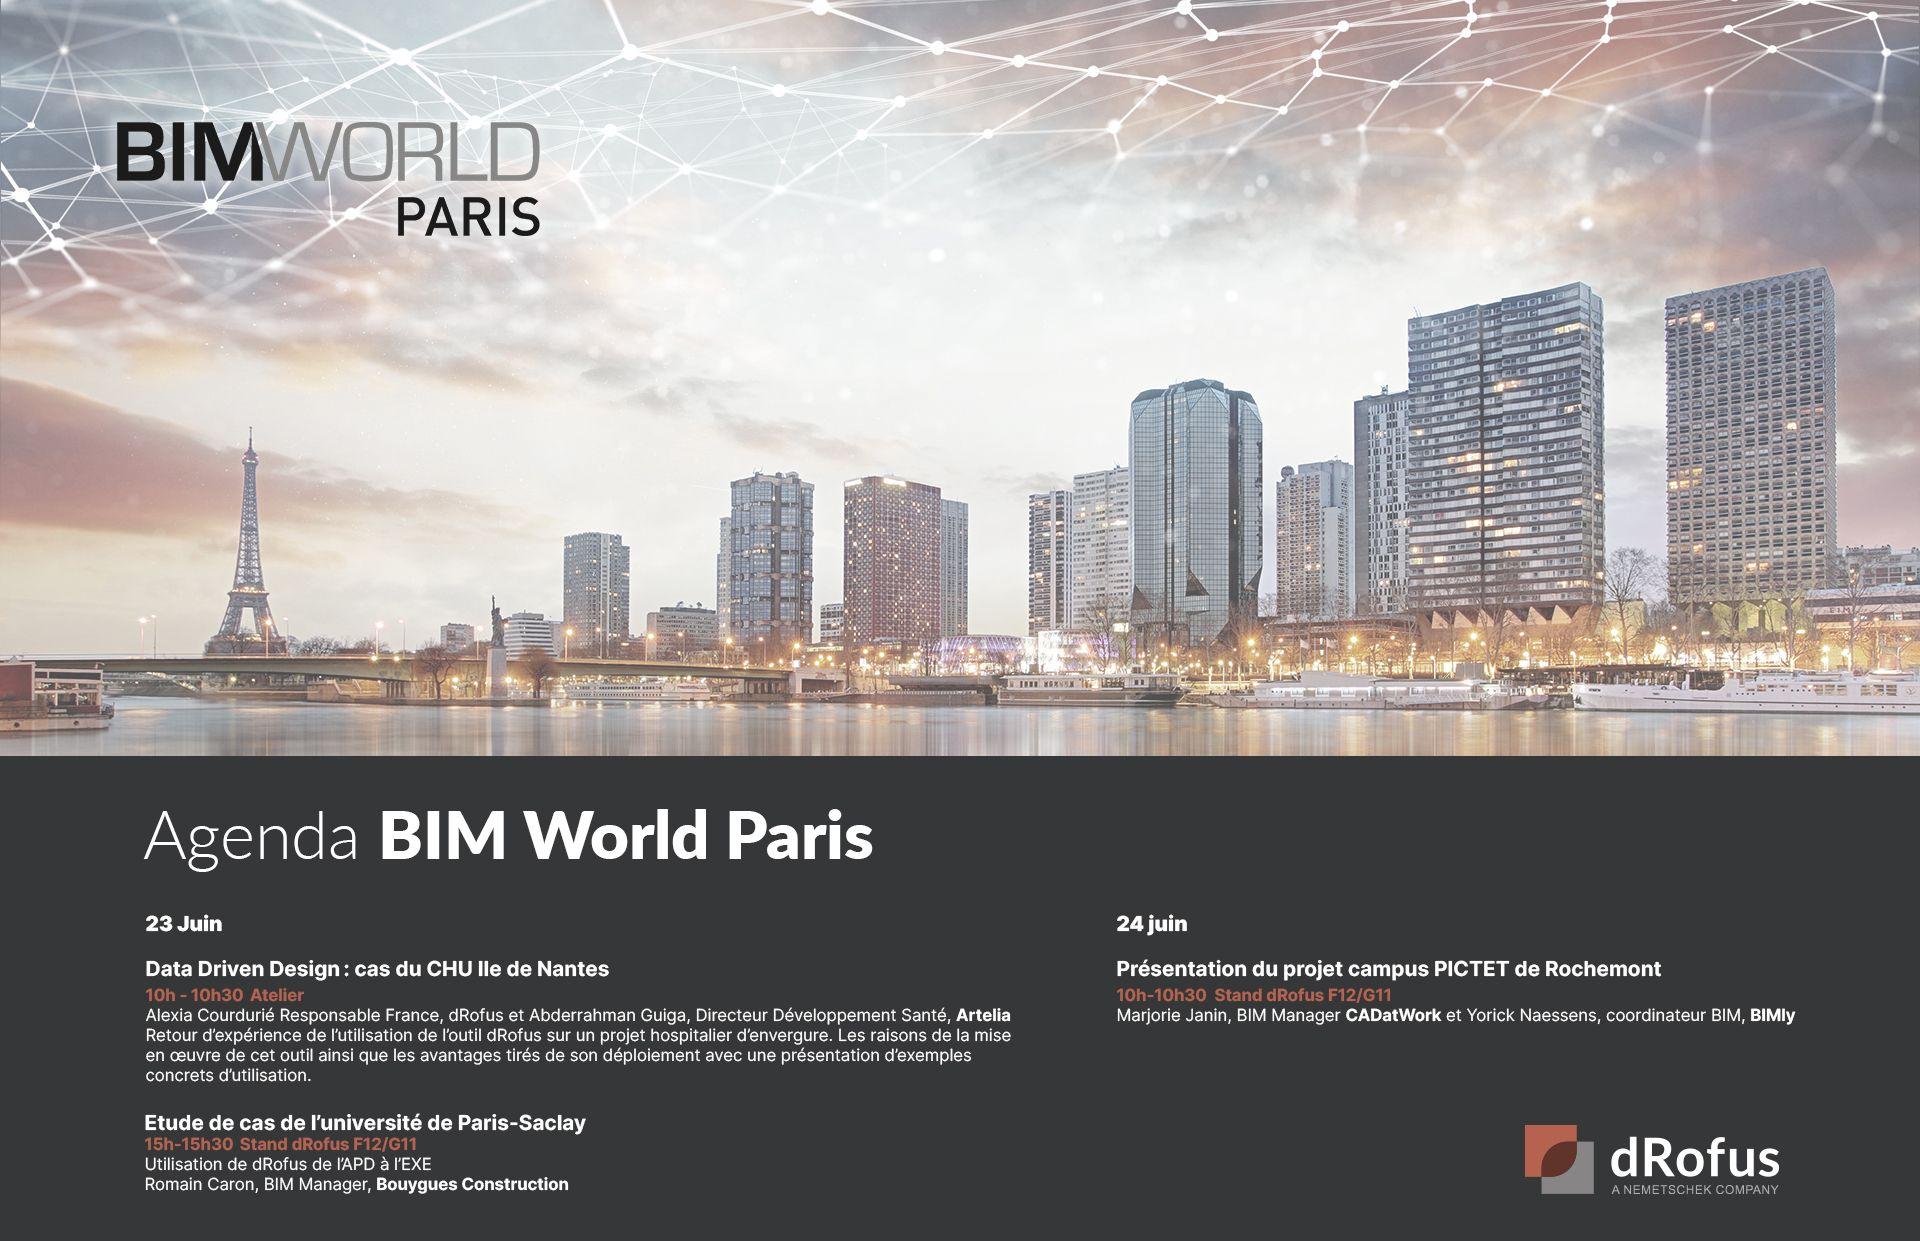 dRofus BIM World Paris